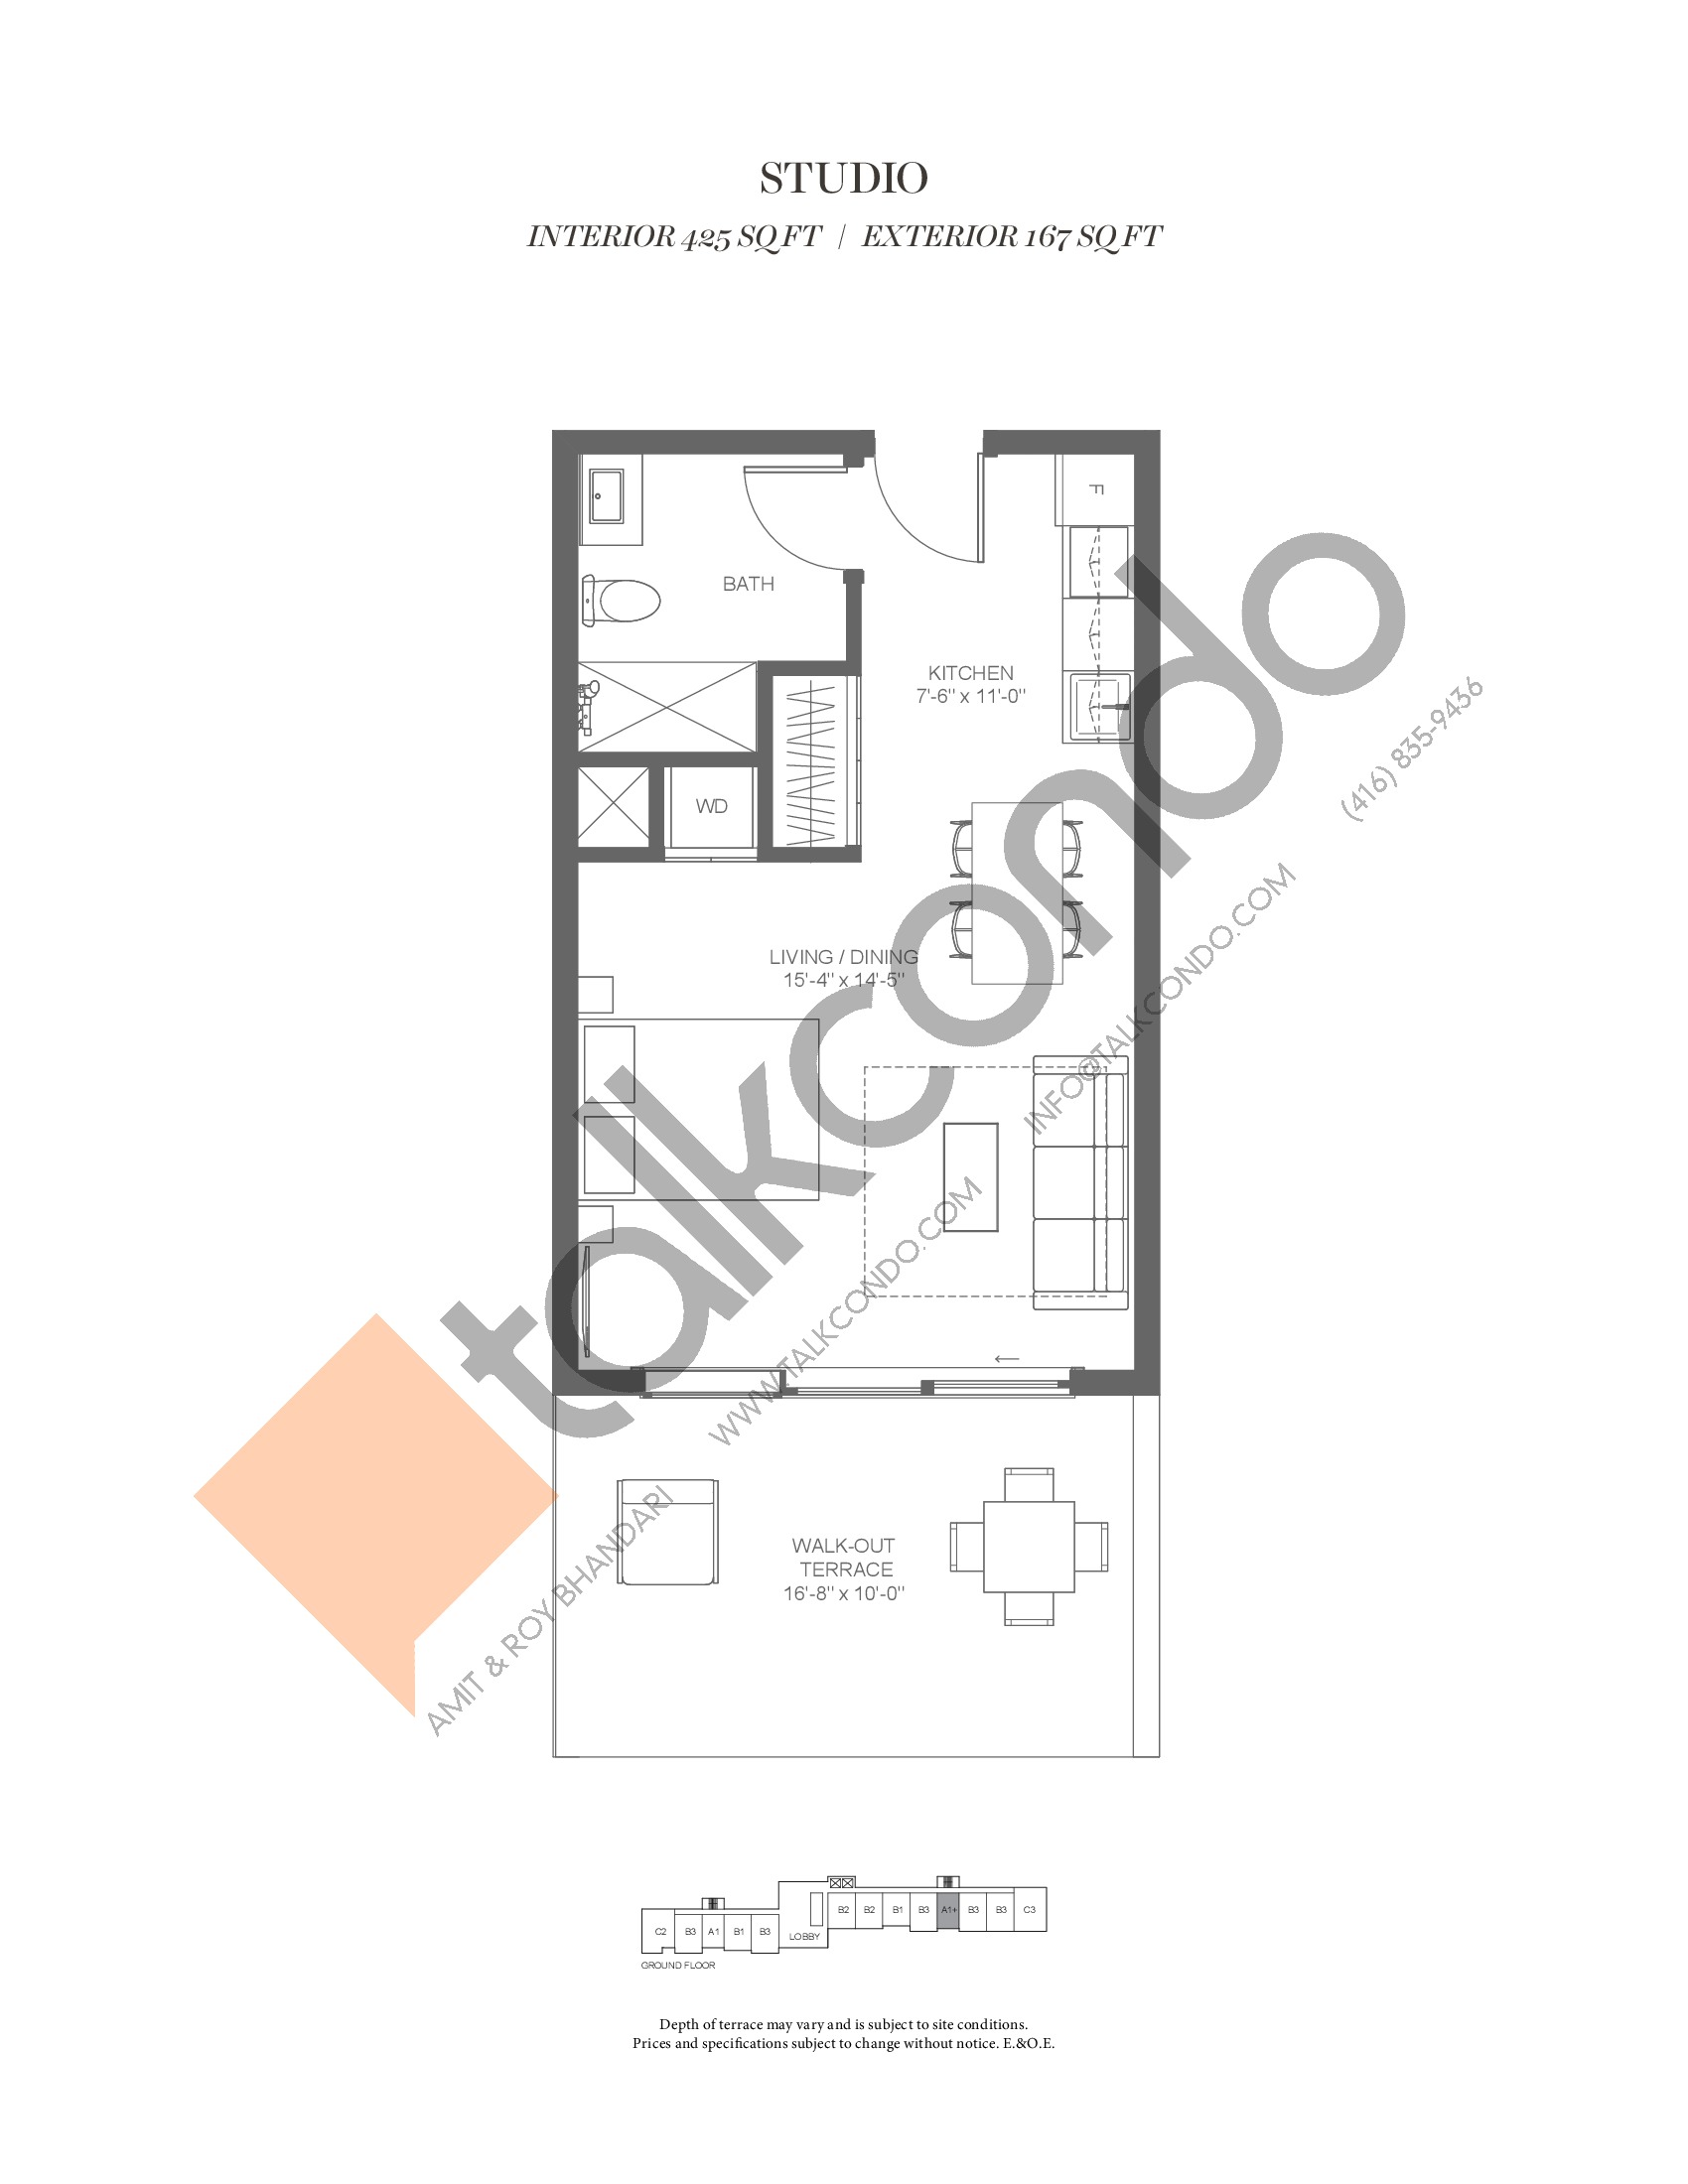 A1+ (Fairway Collection) Floor Plan at Muskoka Bay Resort - 425 sq.ft